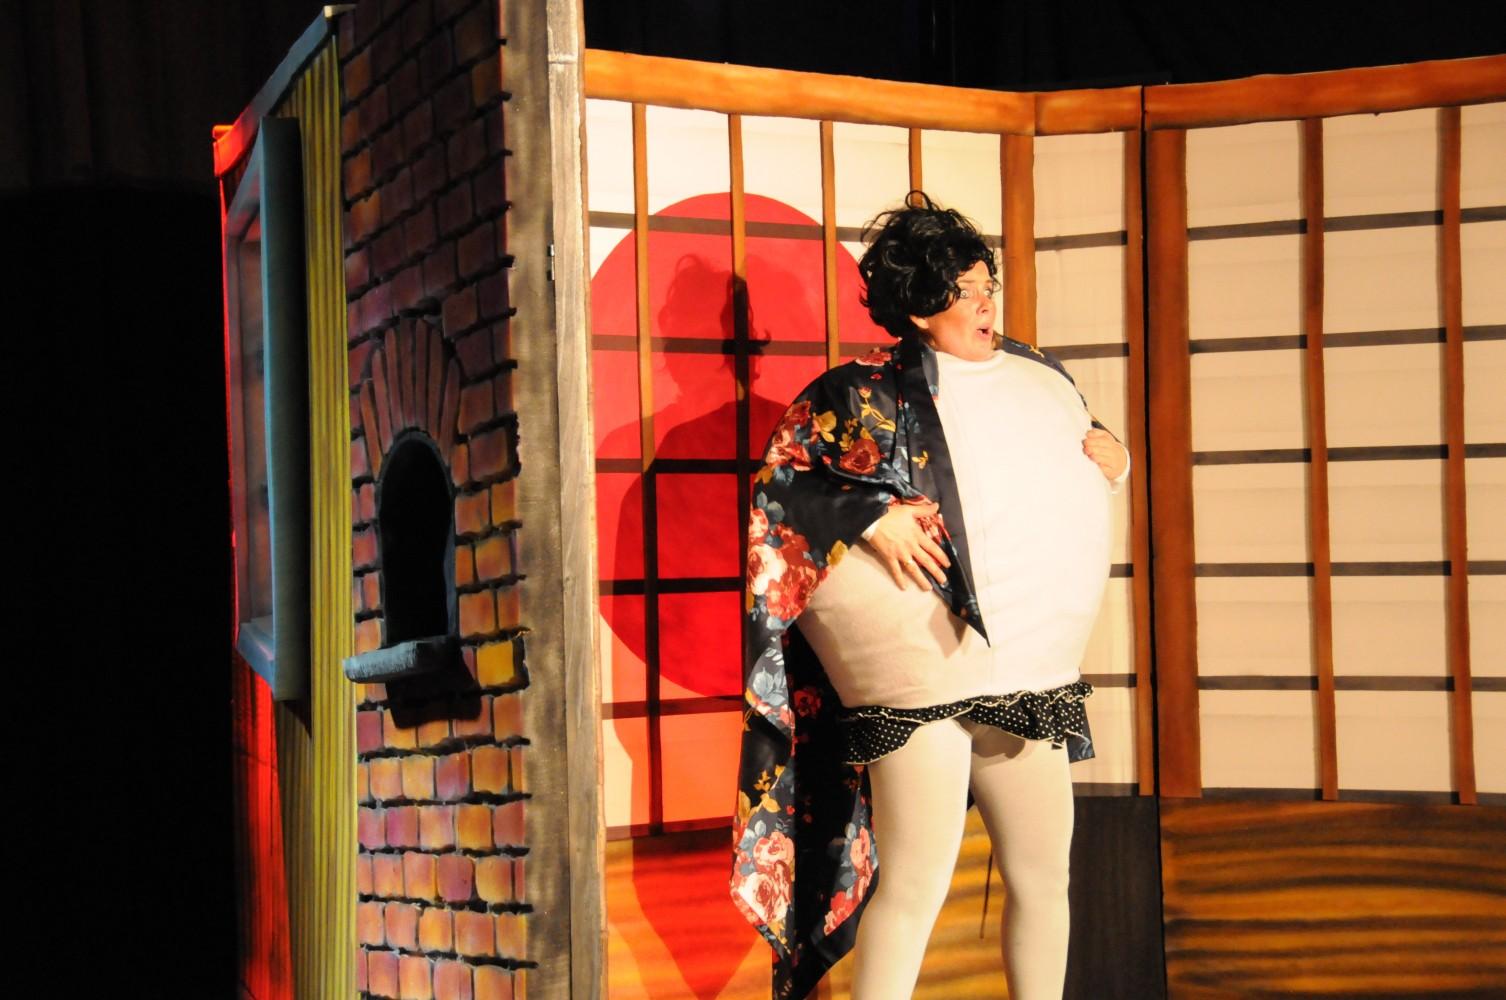 En person kledd ut som en kompe, i en Asiatisk setting. Foto.